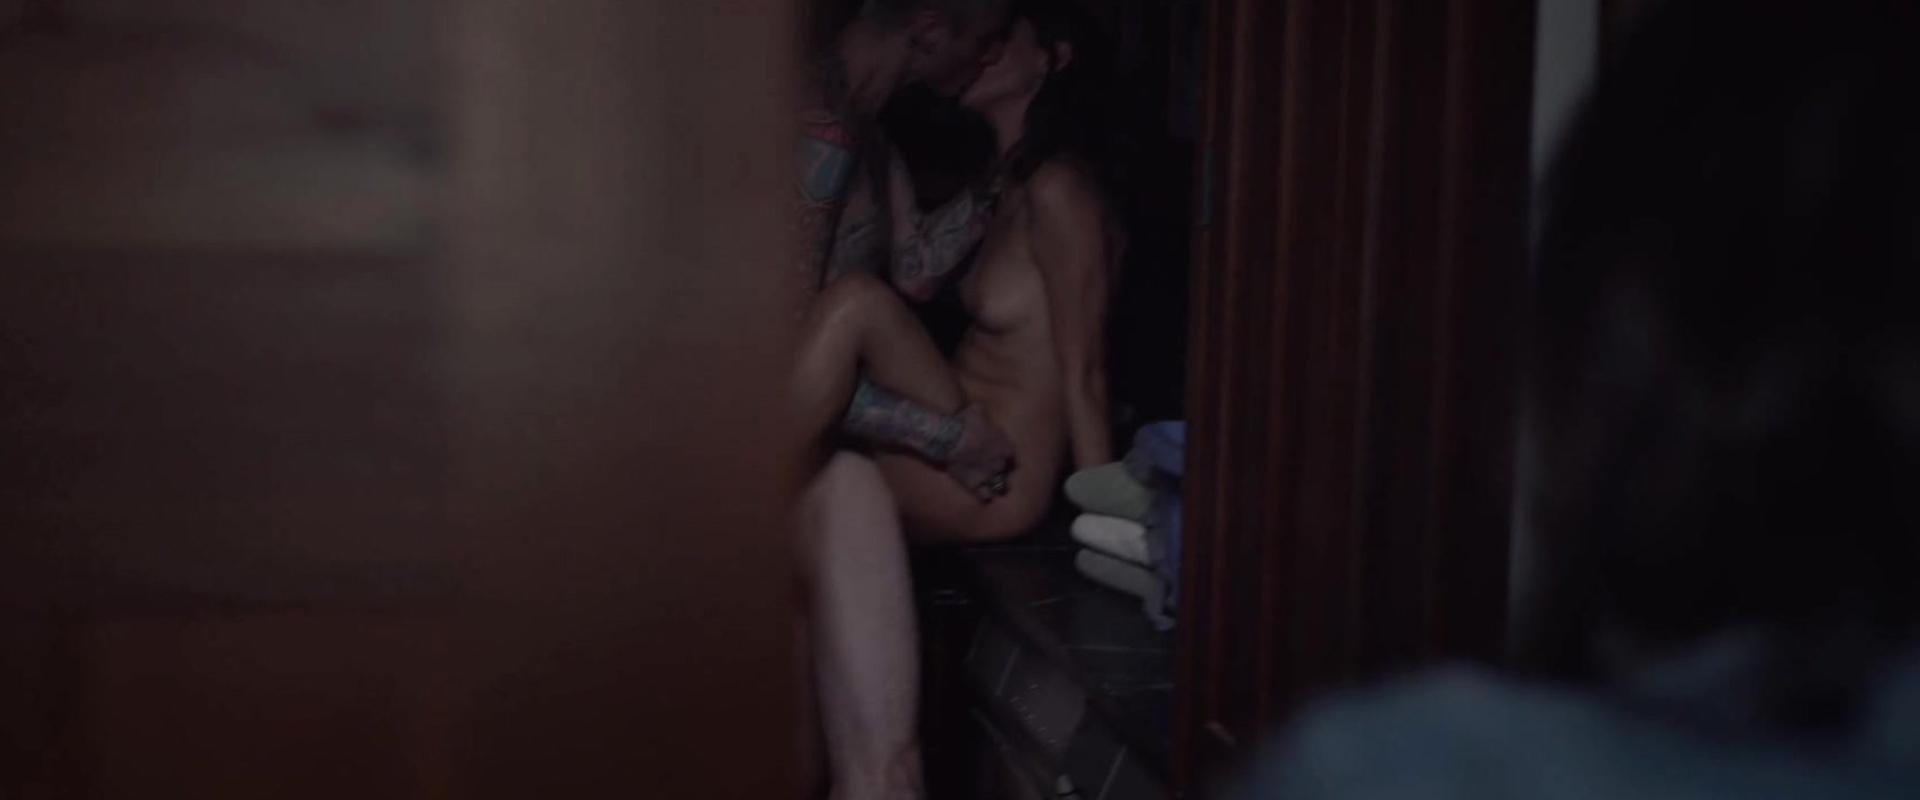 Ana Ayora Nude rosa salazar nude in bird box (2018) - celebs roulette tube